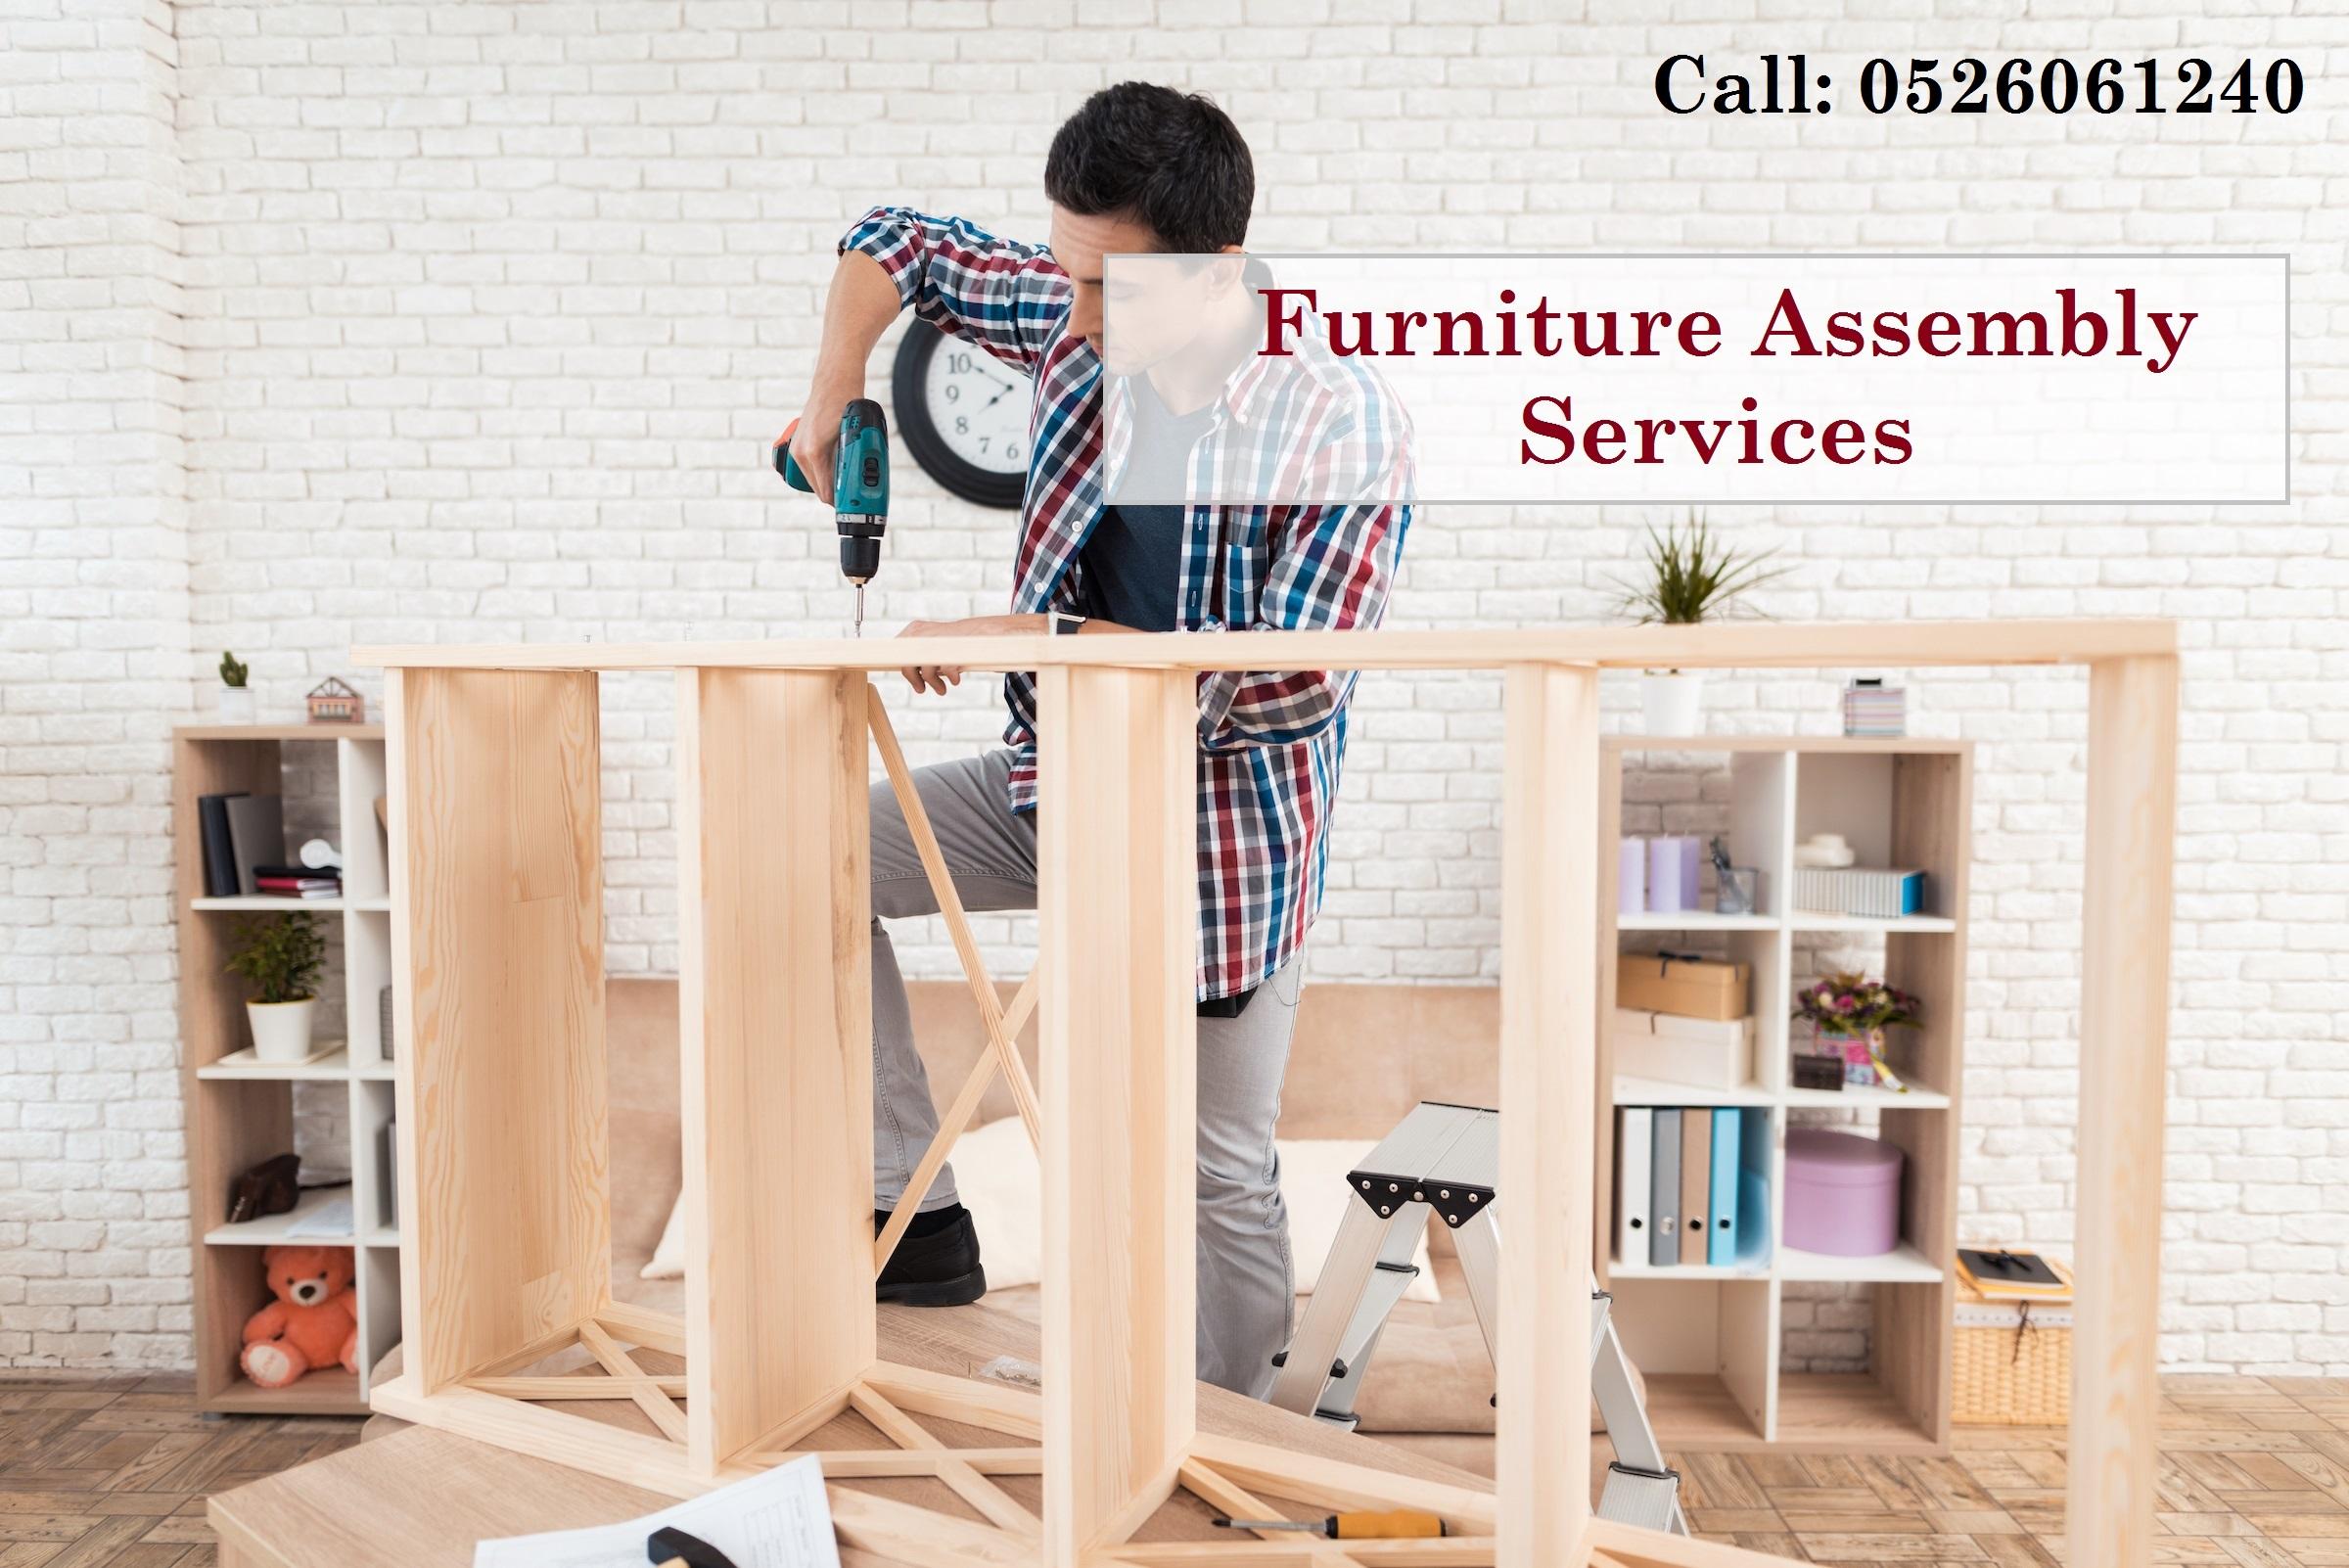 IKEA Furniture Assembly Services in Dubai : Repair : 0526061240